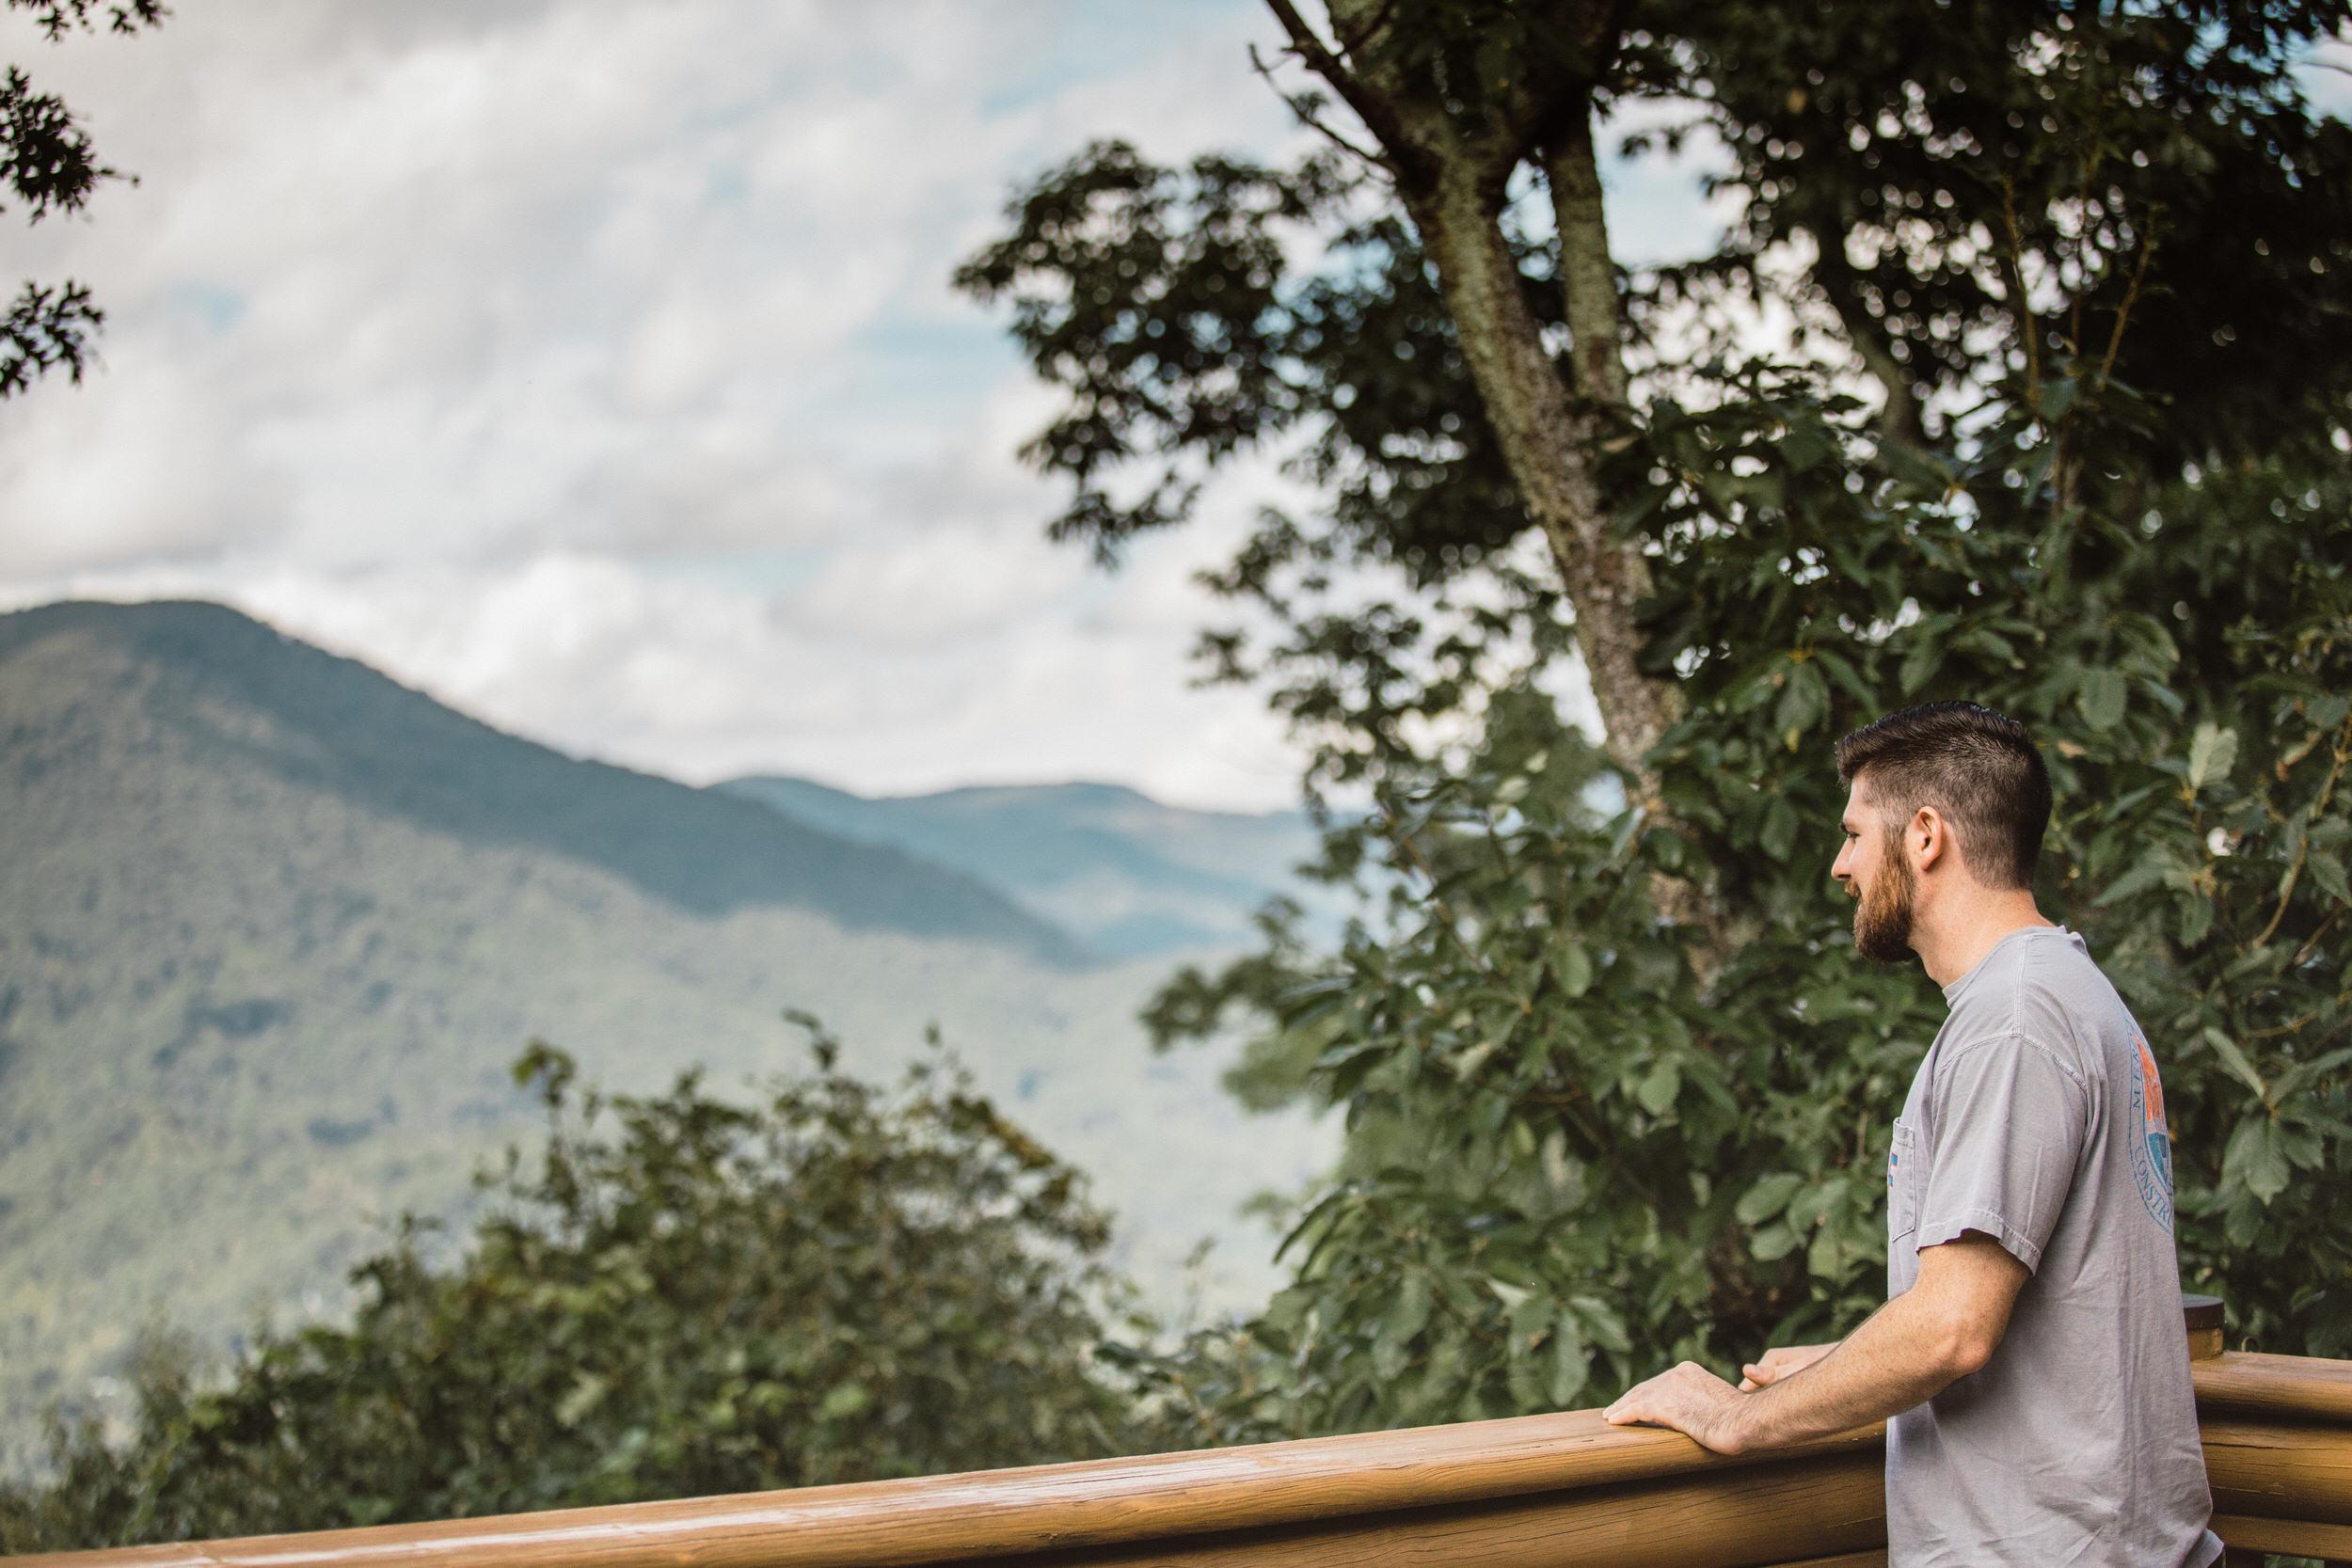 2. Groom's Morning - Cole + Rachel's Great Smoky Mountain National Park Elopement-20.jpg